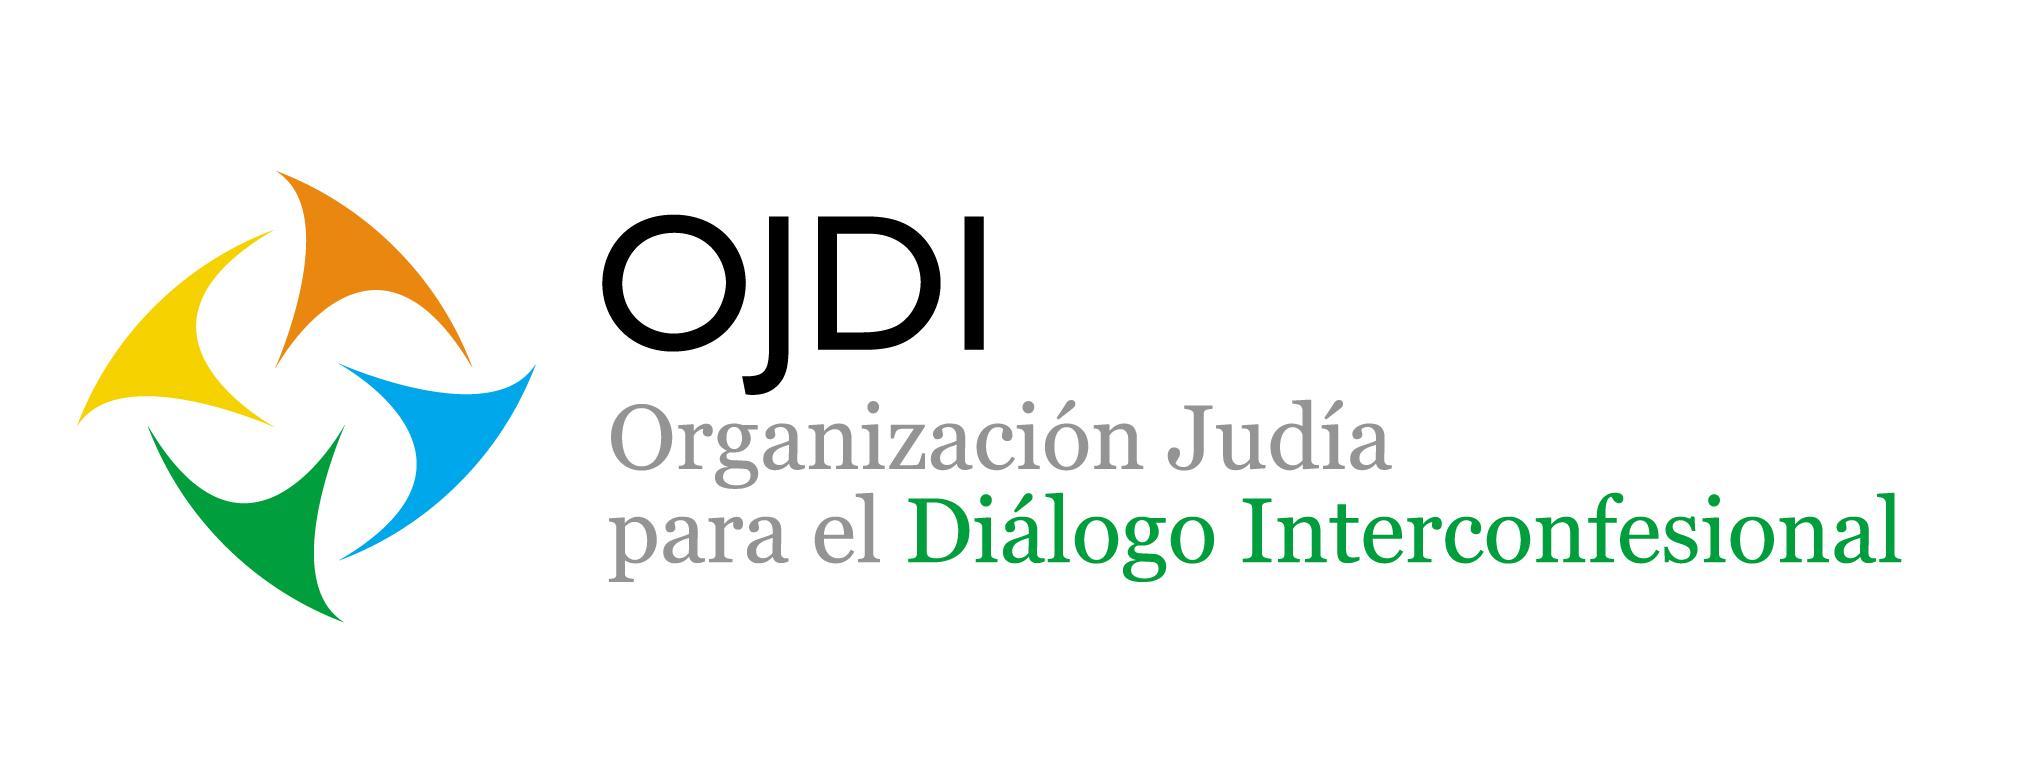 logo_300dpi_RGB